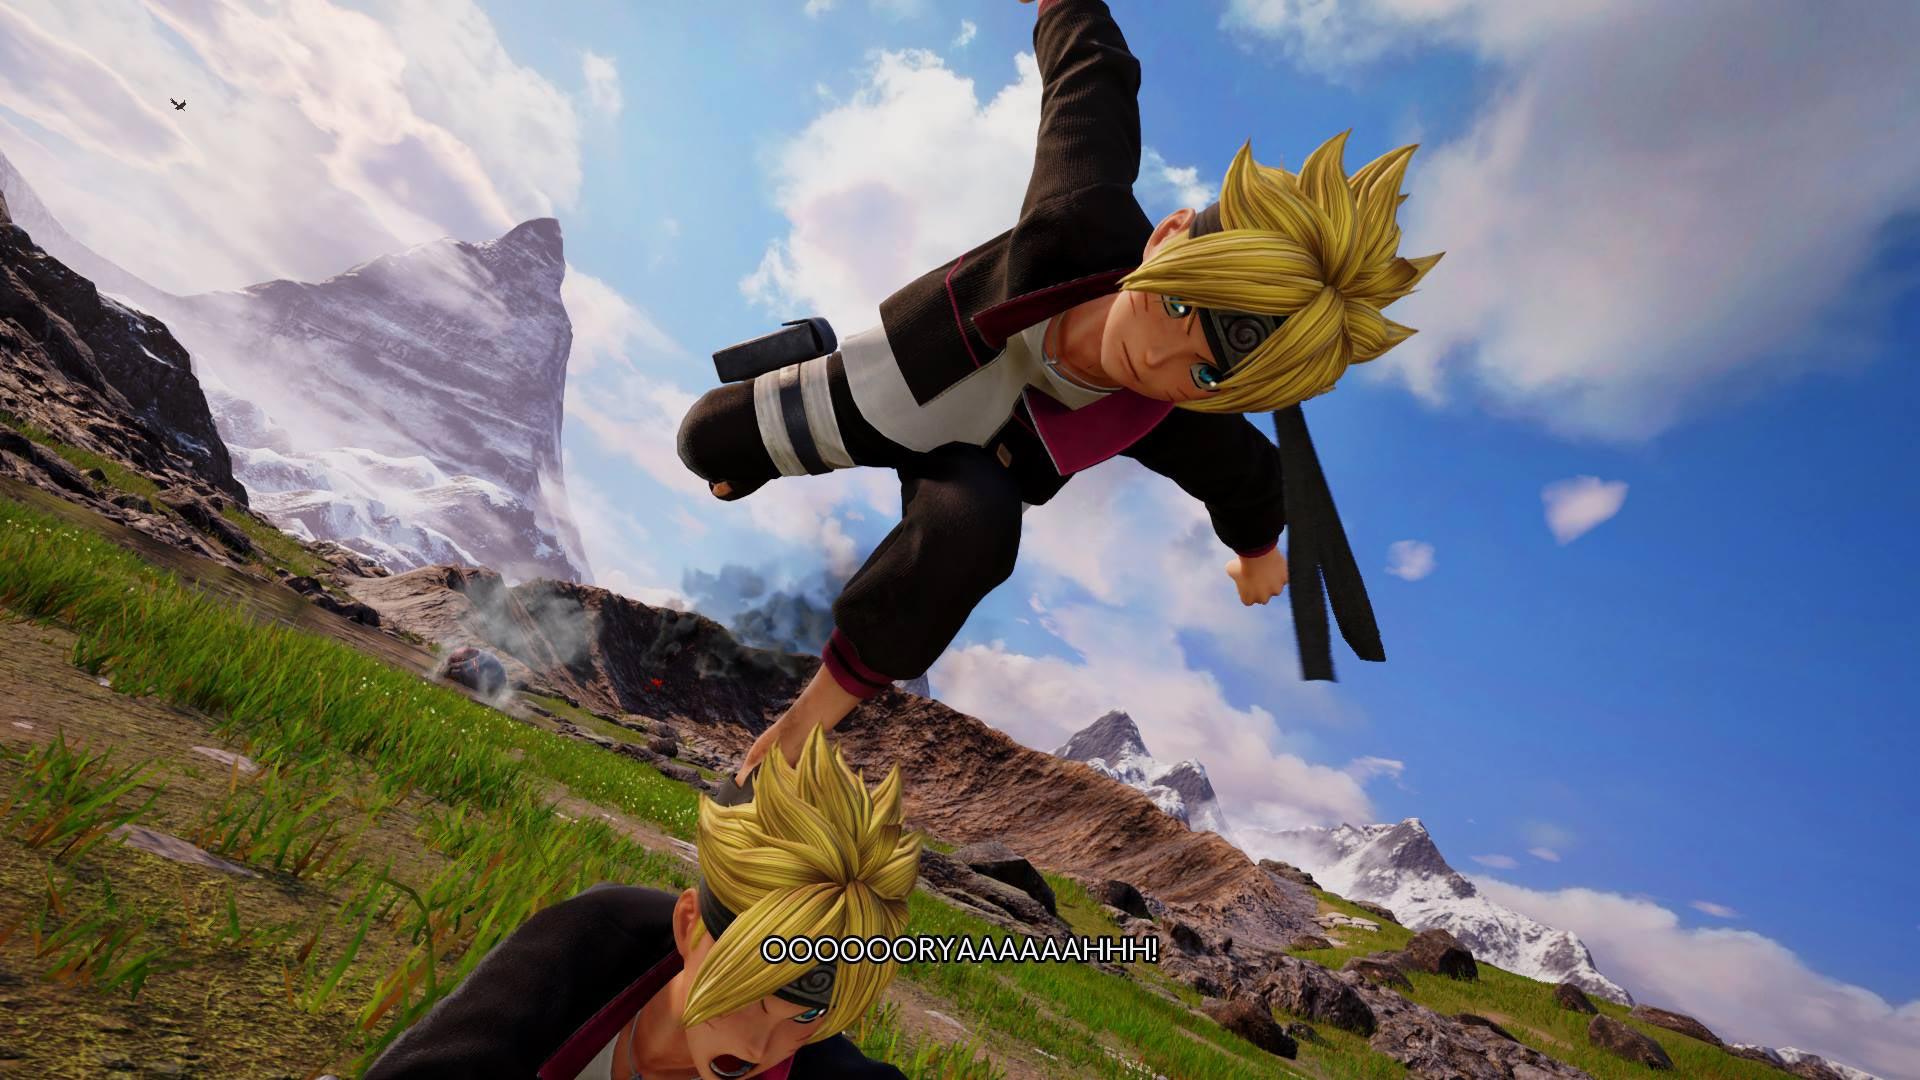 New Jump Force screenshots for Boruto, Kakashi, Gaara and Kaguya 4 out of 9 image gallery